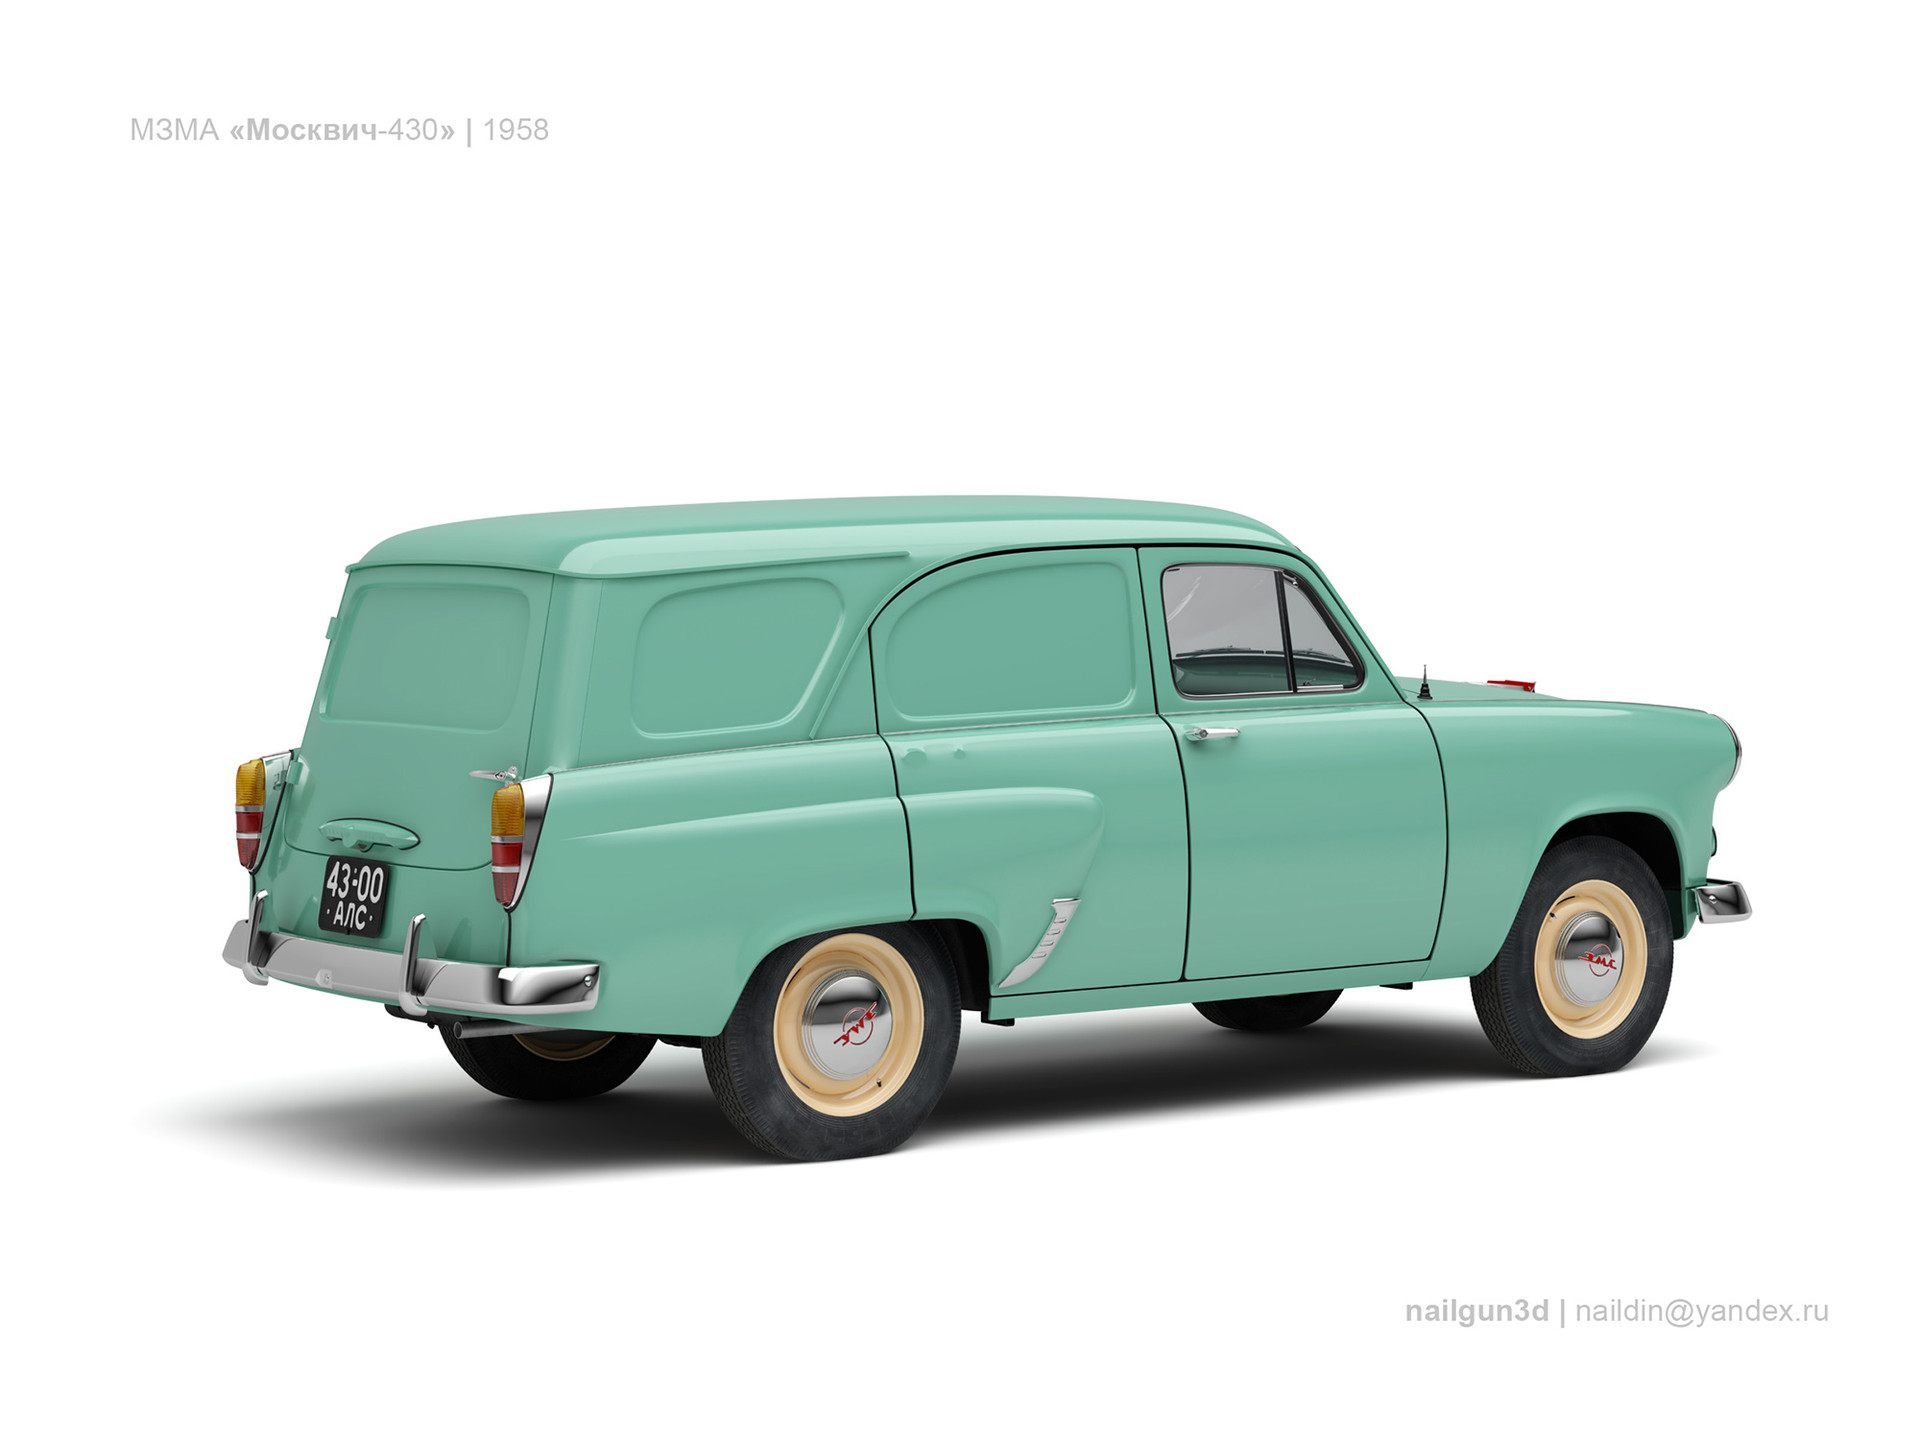 Nail khusnutdinov ussr moskvich 430 1958 1